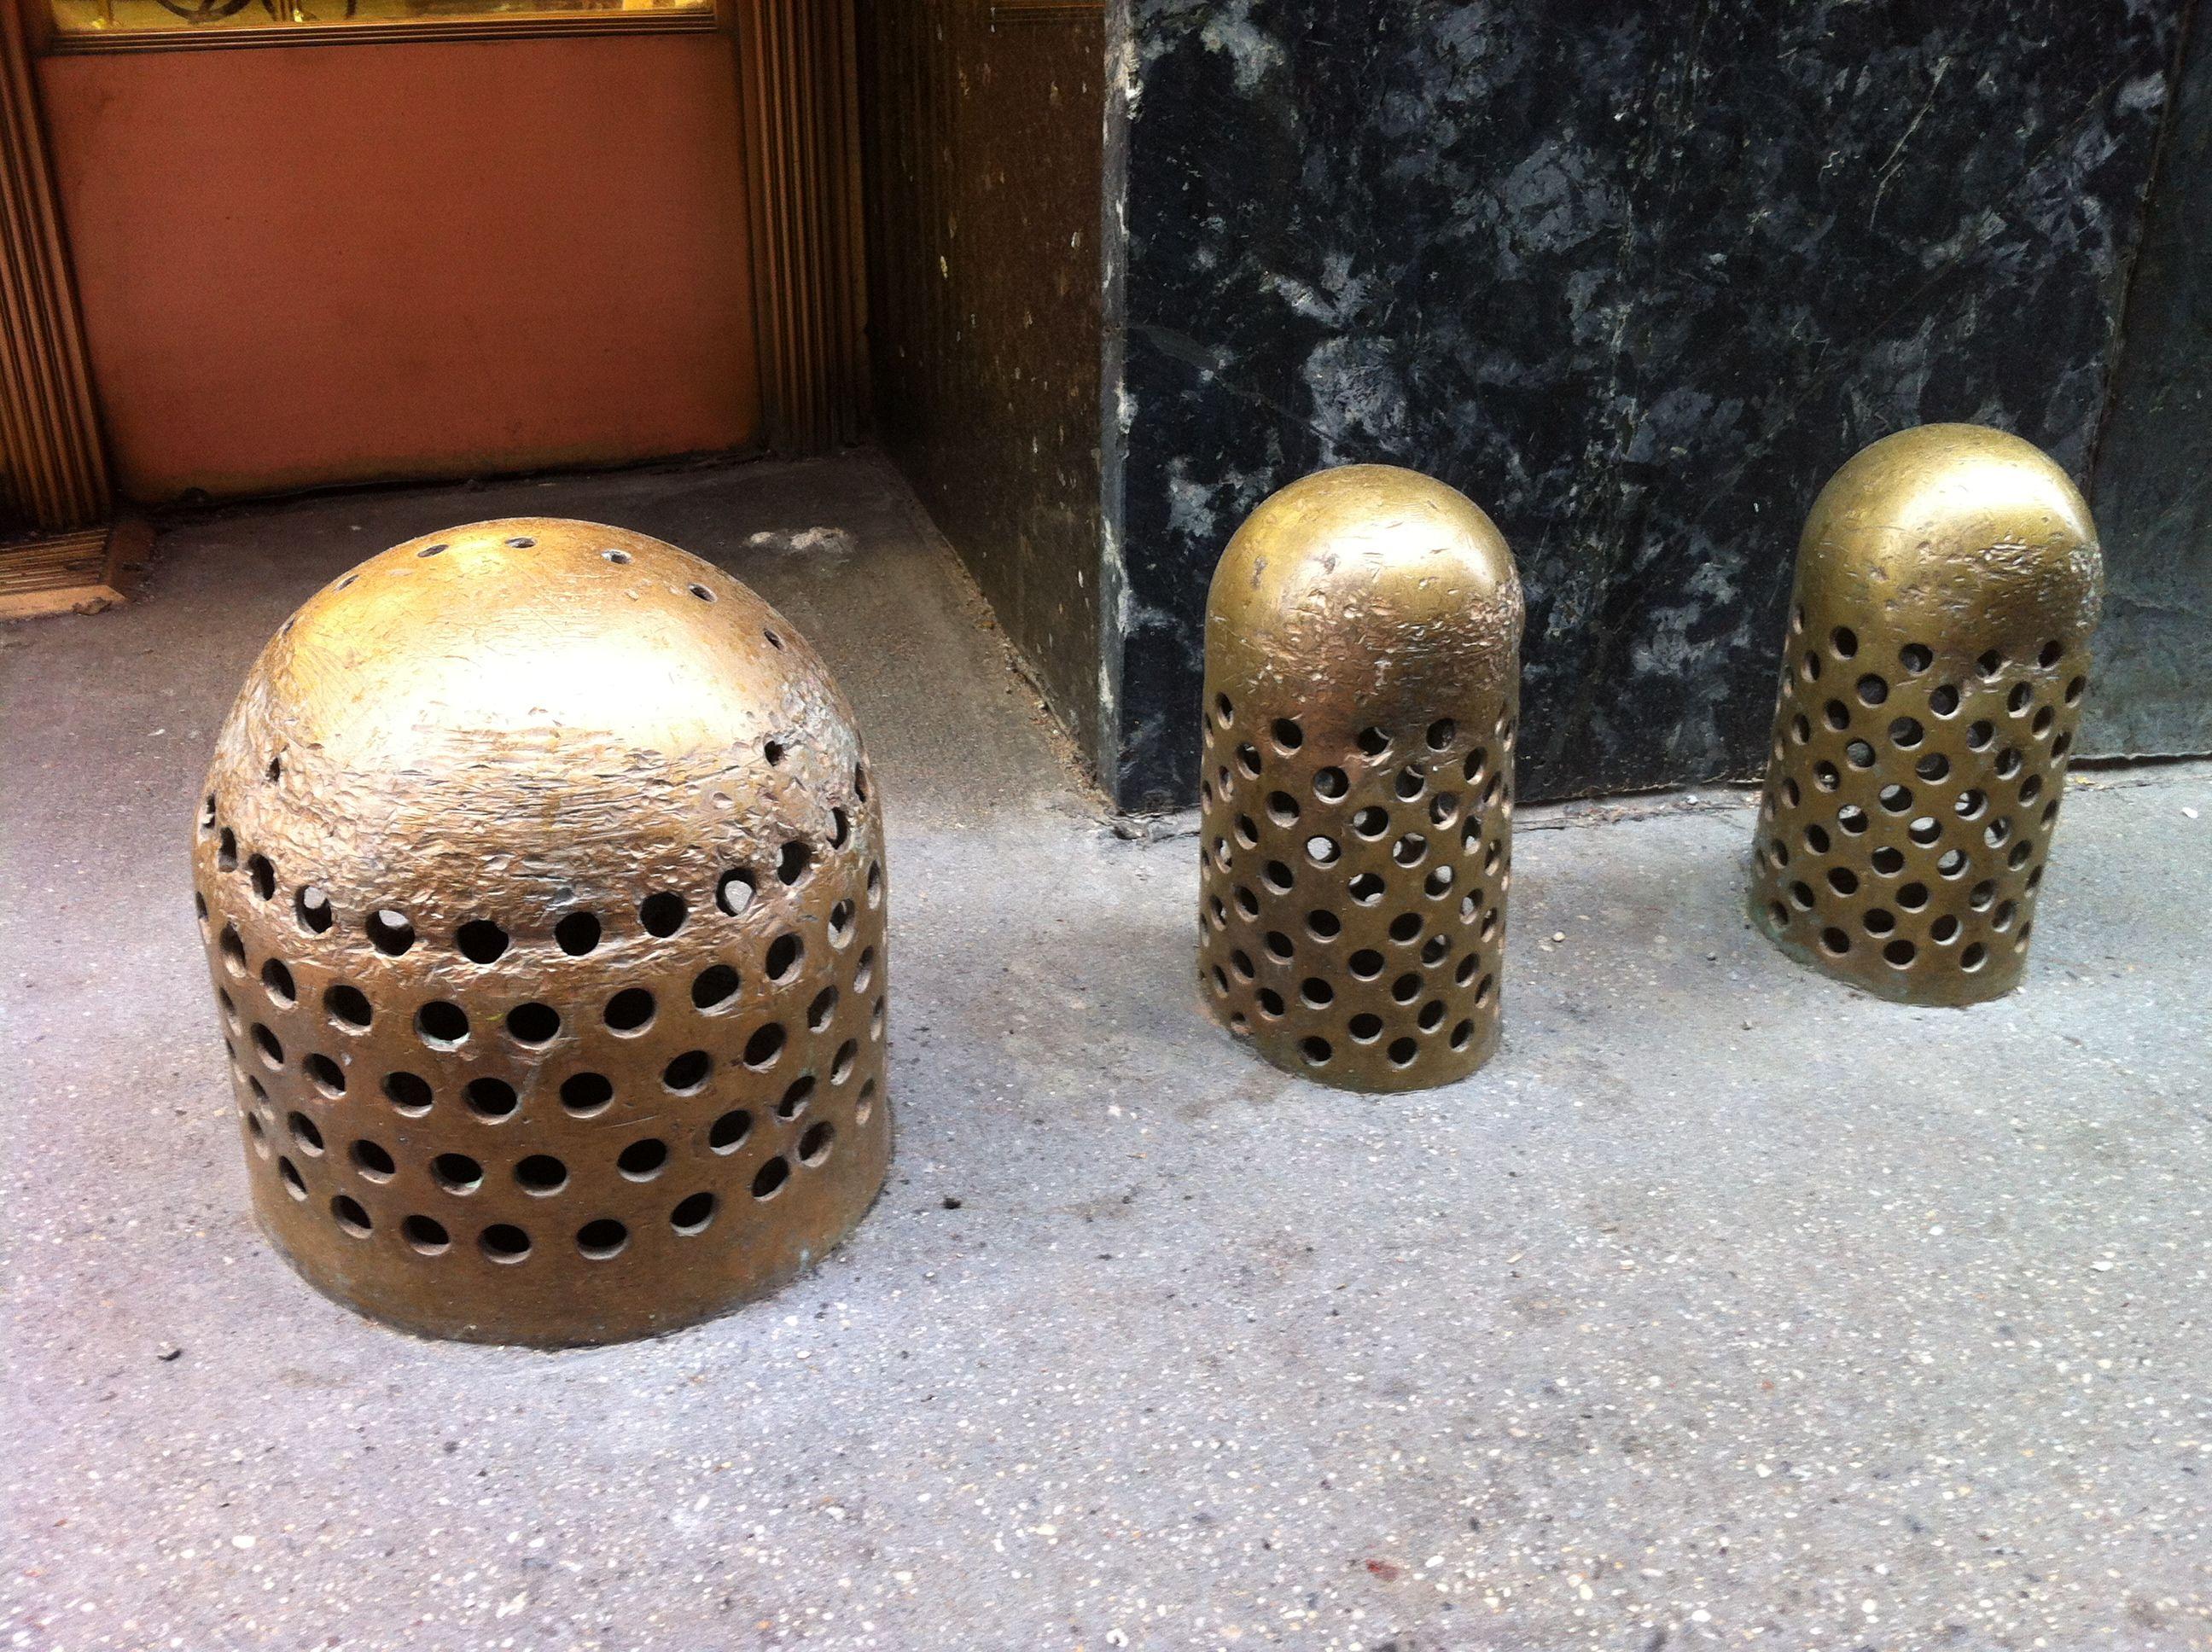 05-08-12: Brass beehives? Sidewalk thimbles? Whiffle warheads?